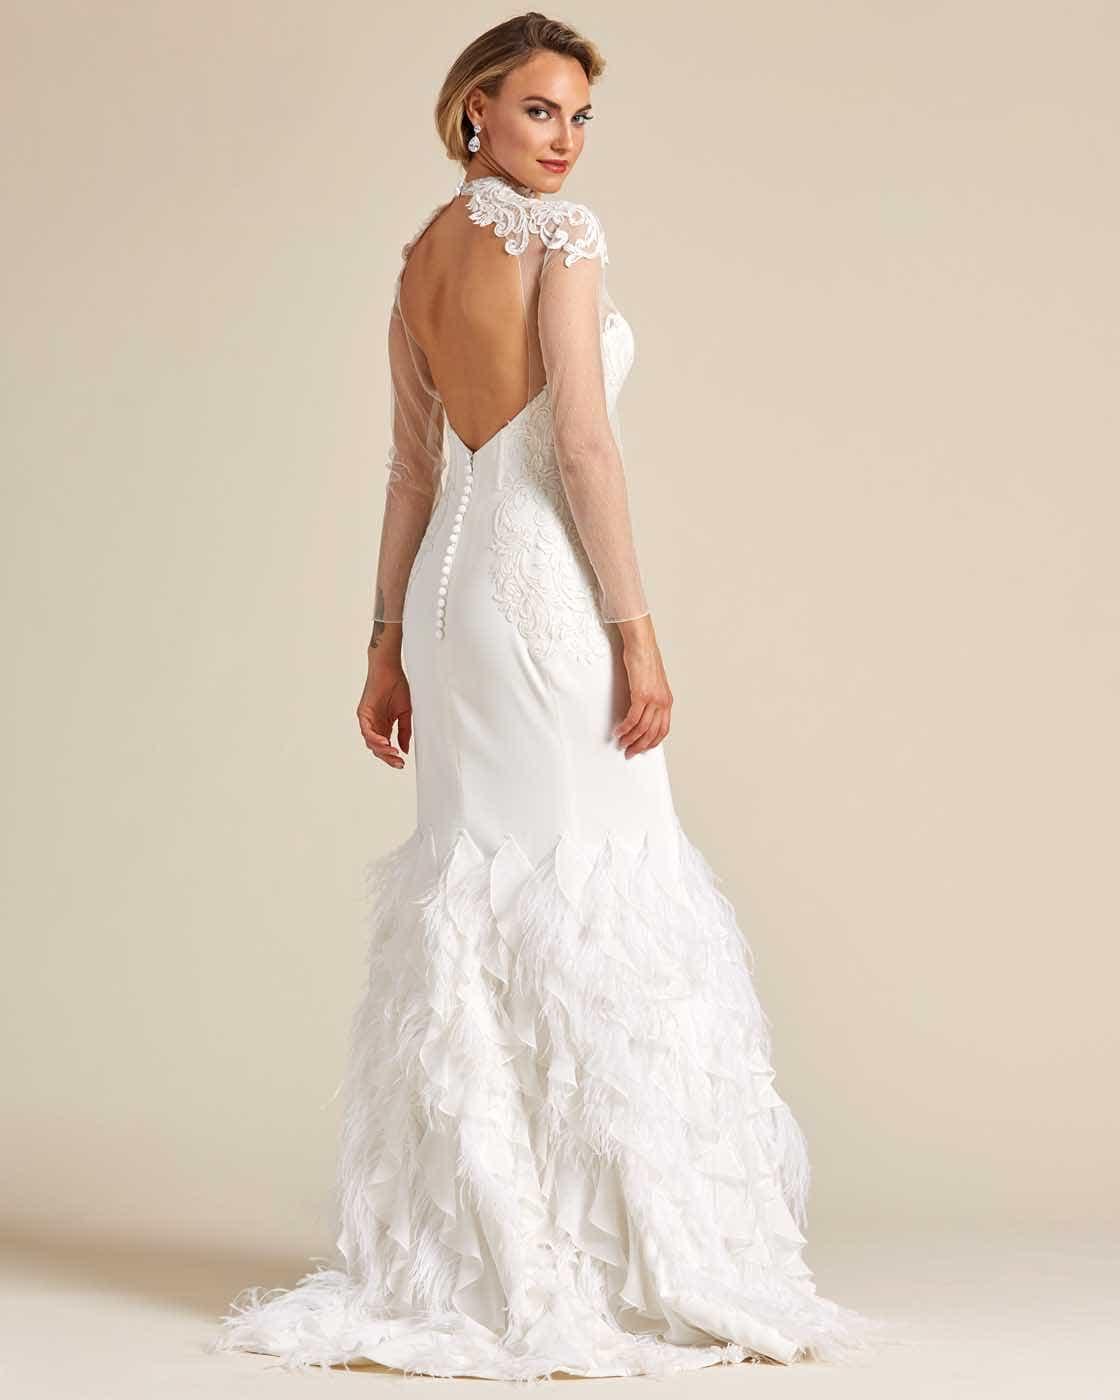 White Ivory Ruffled Mermaid Tail Wedding Gown - Back